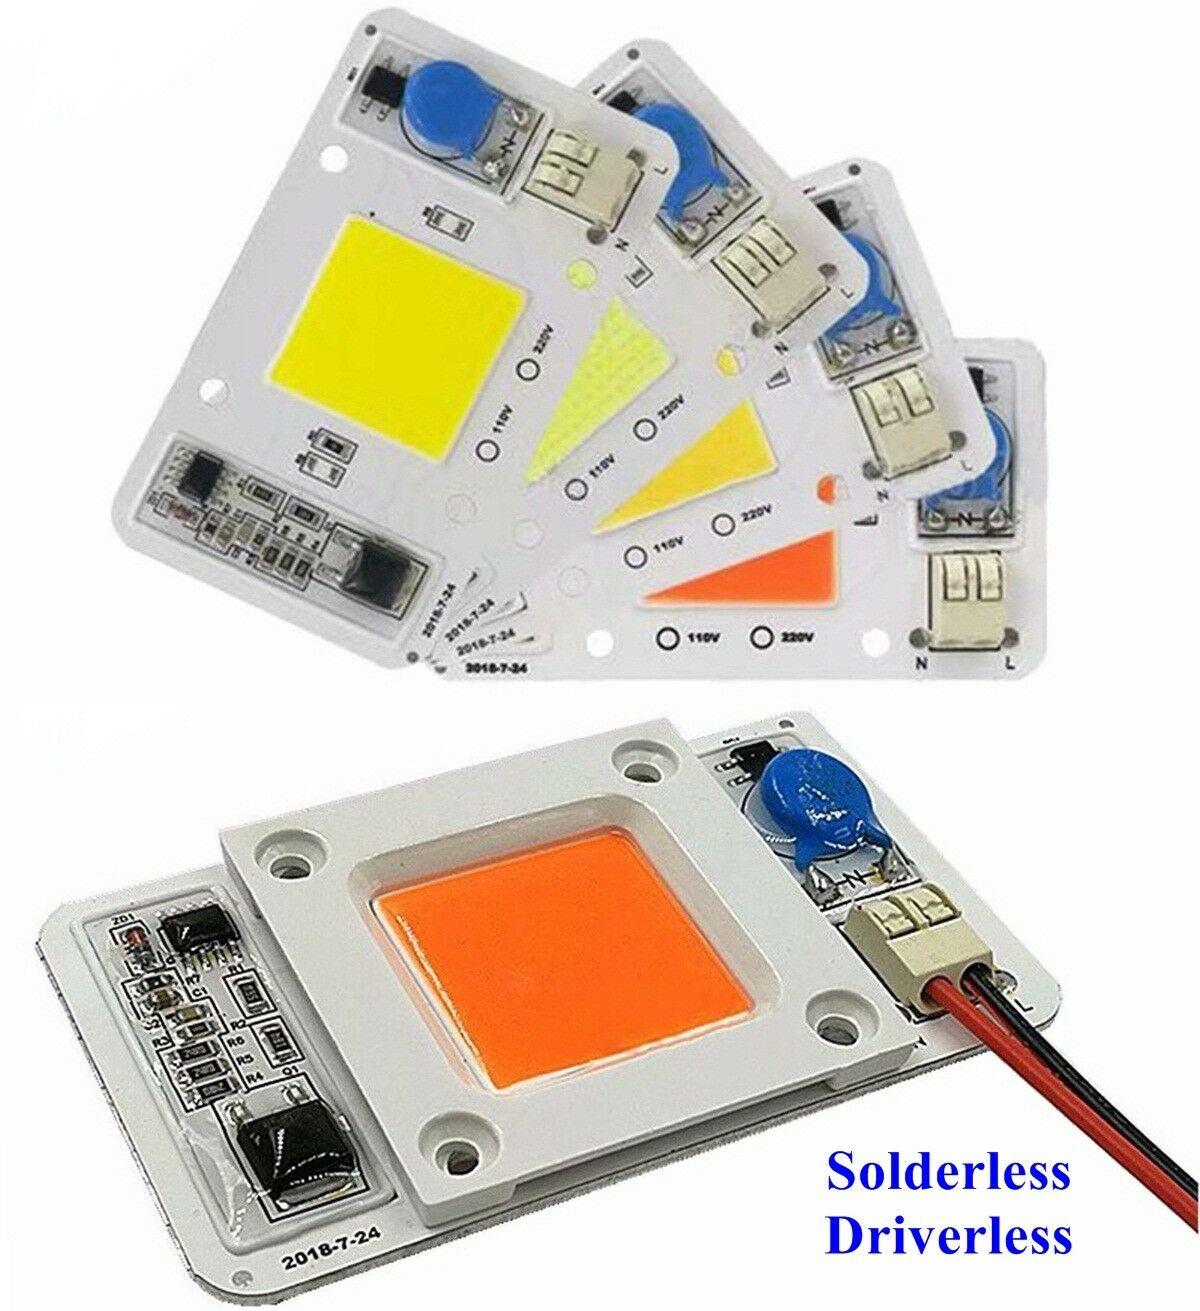 50W Driverless Solderless LED Chip Integrated Smart IC DIY R G B W Full Spectrum Pink  Whtie 110VAC 220VAC